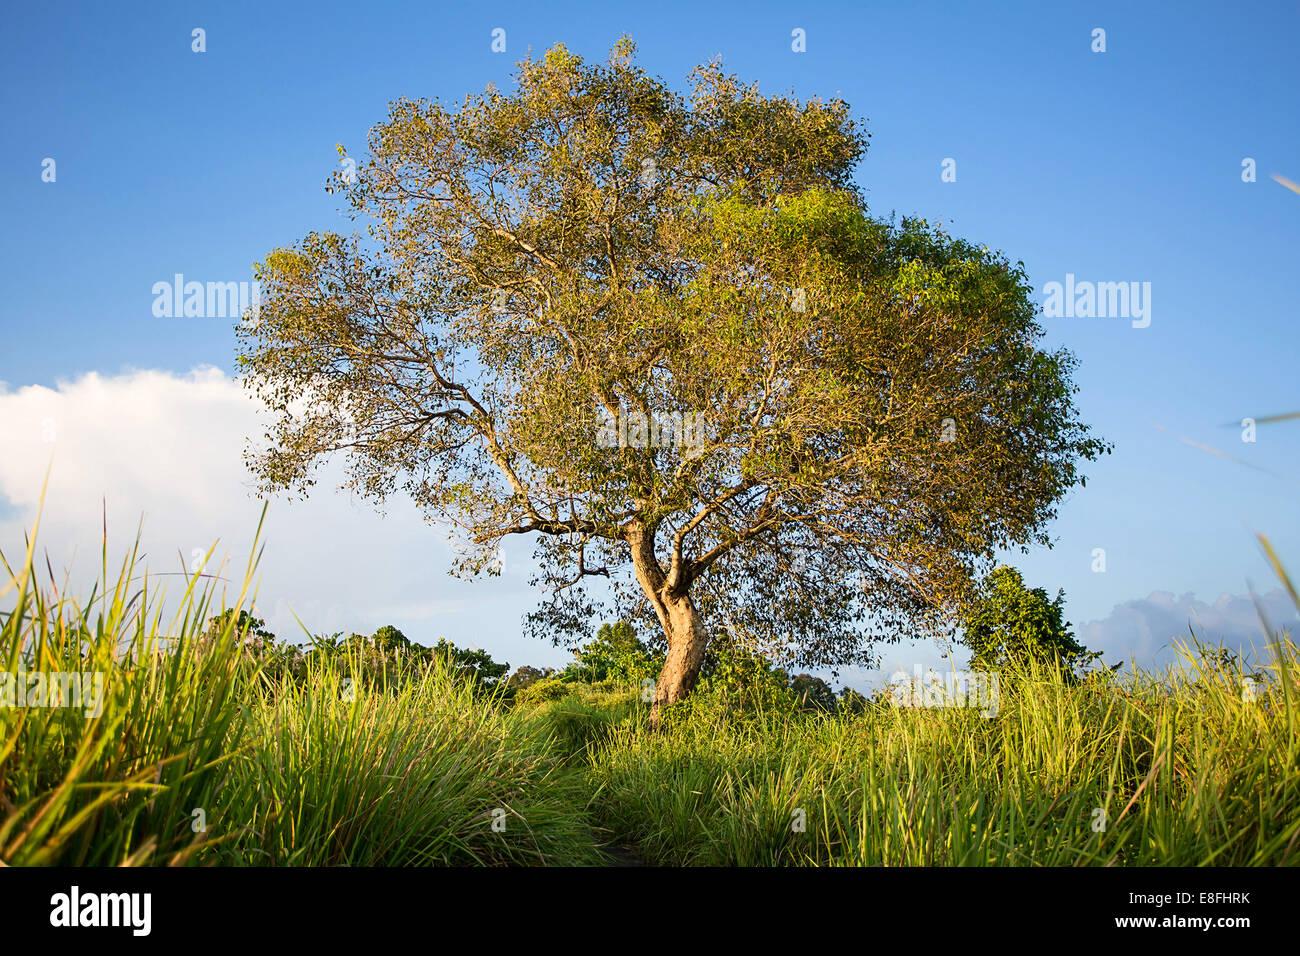 Indonesia, Bali, Ubud, Tree - Stock Image